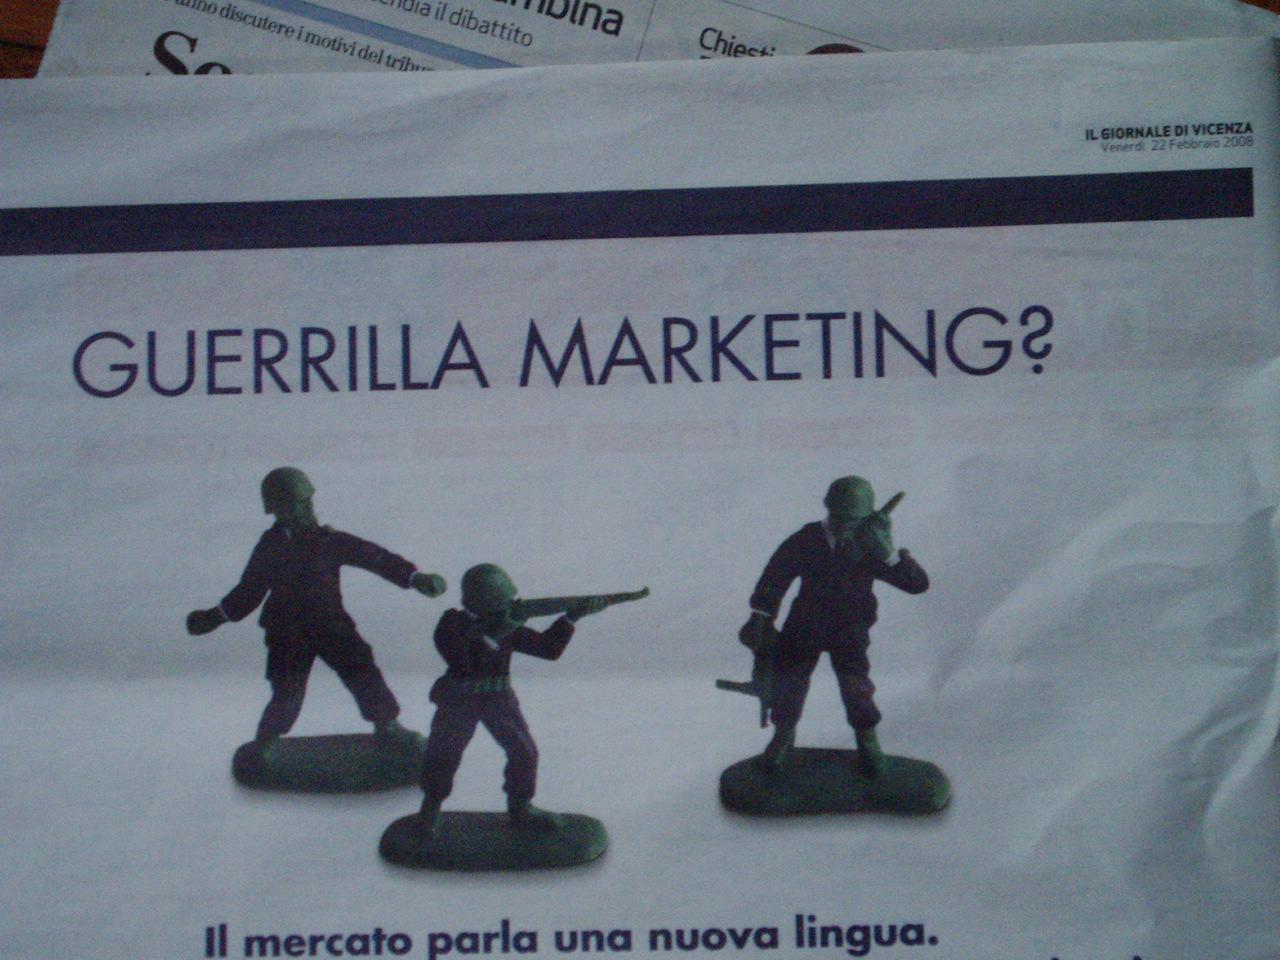 guerriglia marketing fake pubblicità compagni industriali pirate pirate.noblogs.org